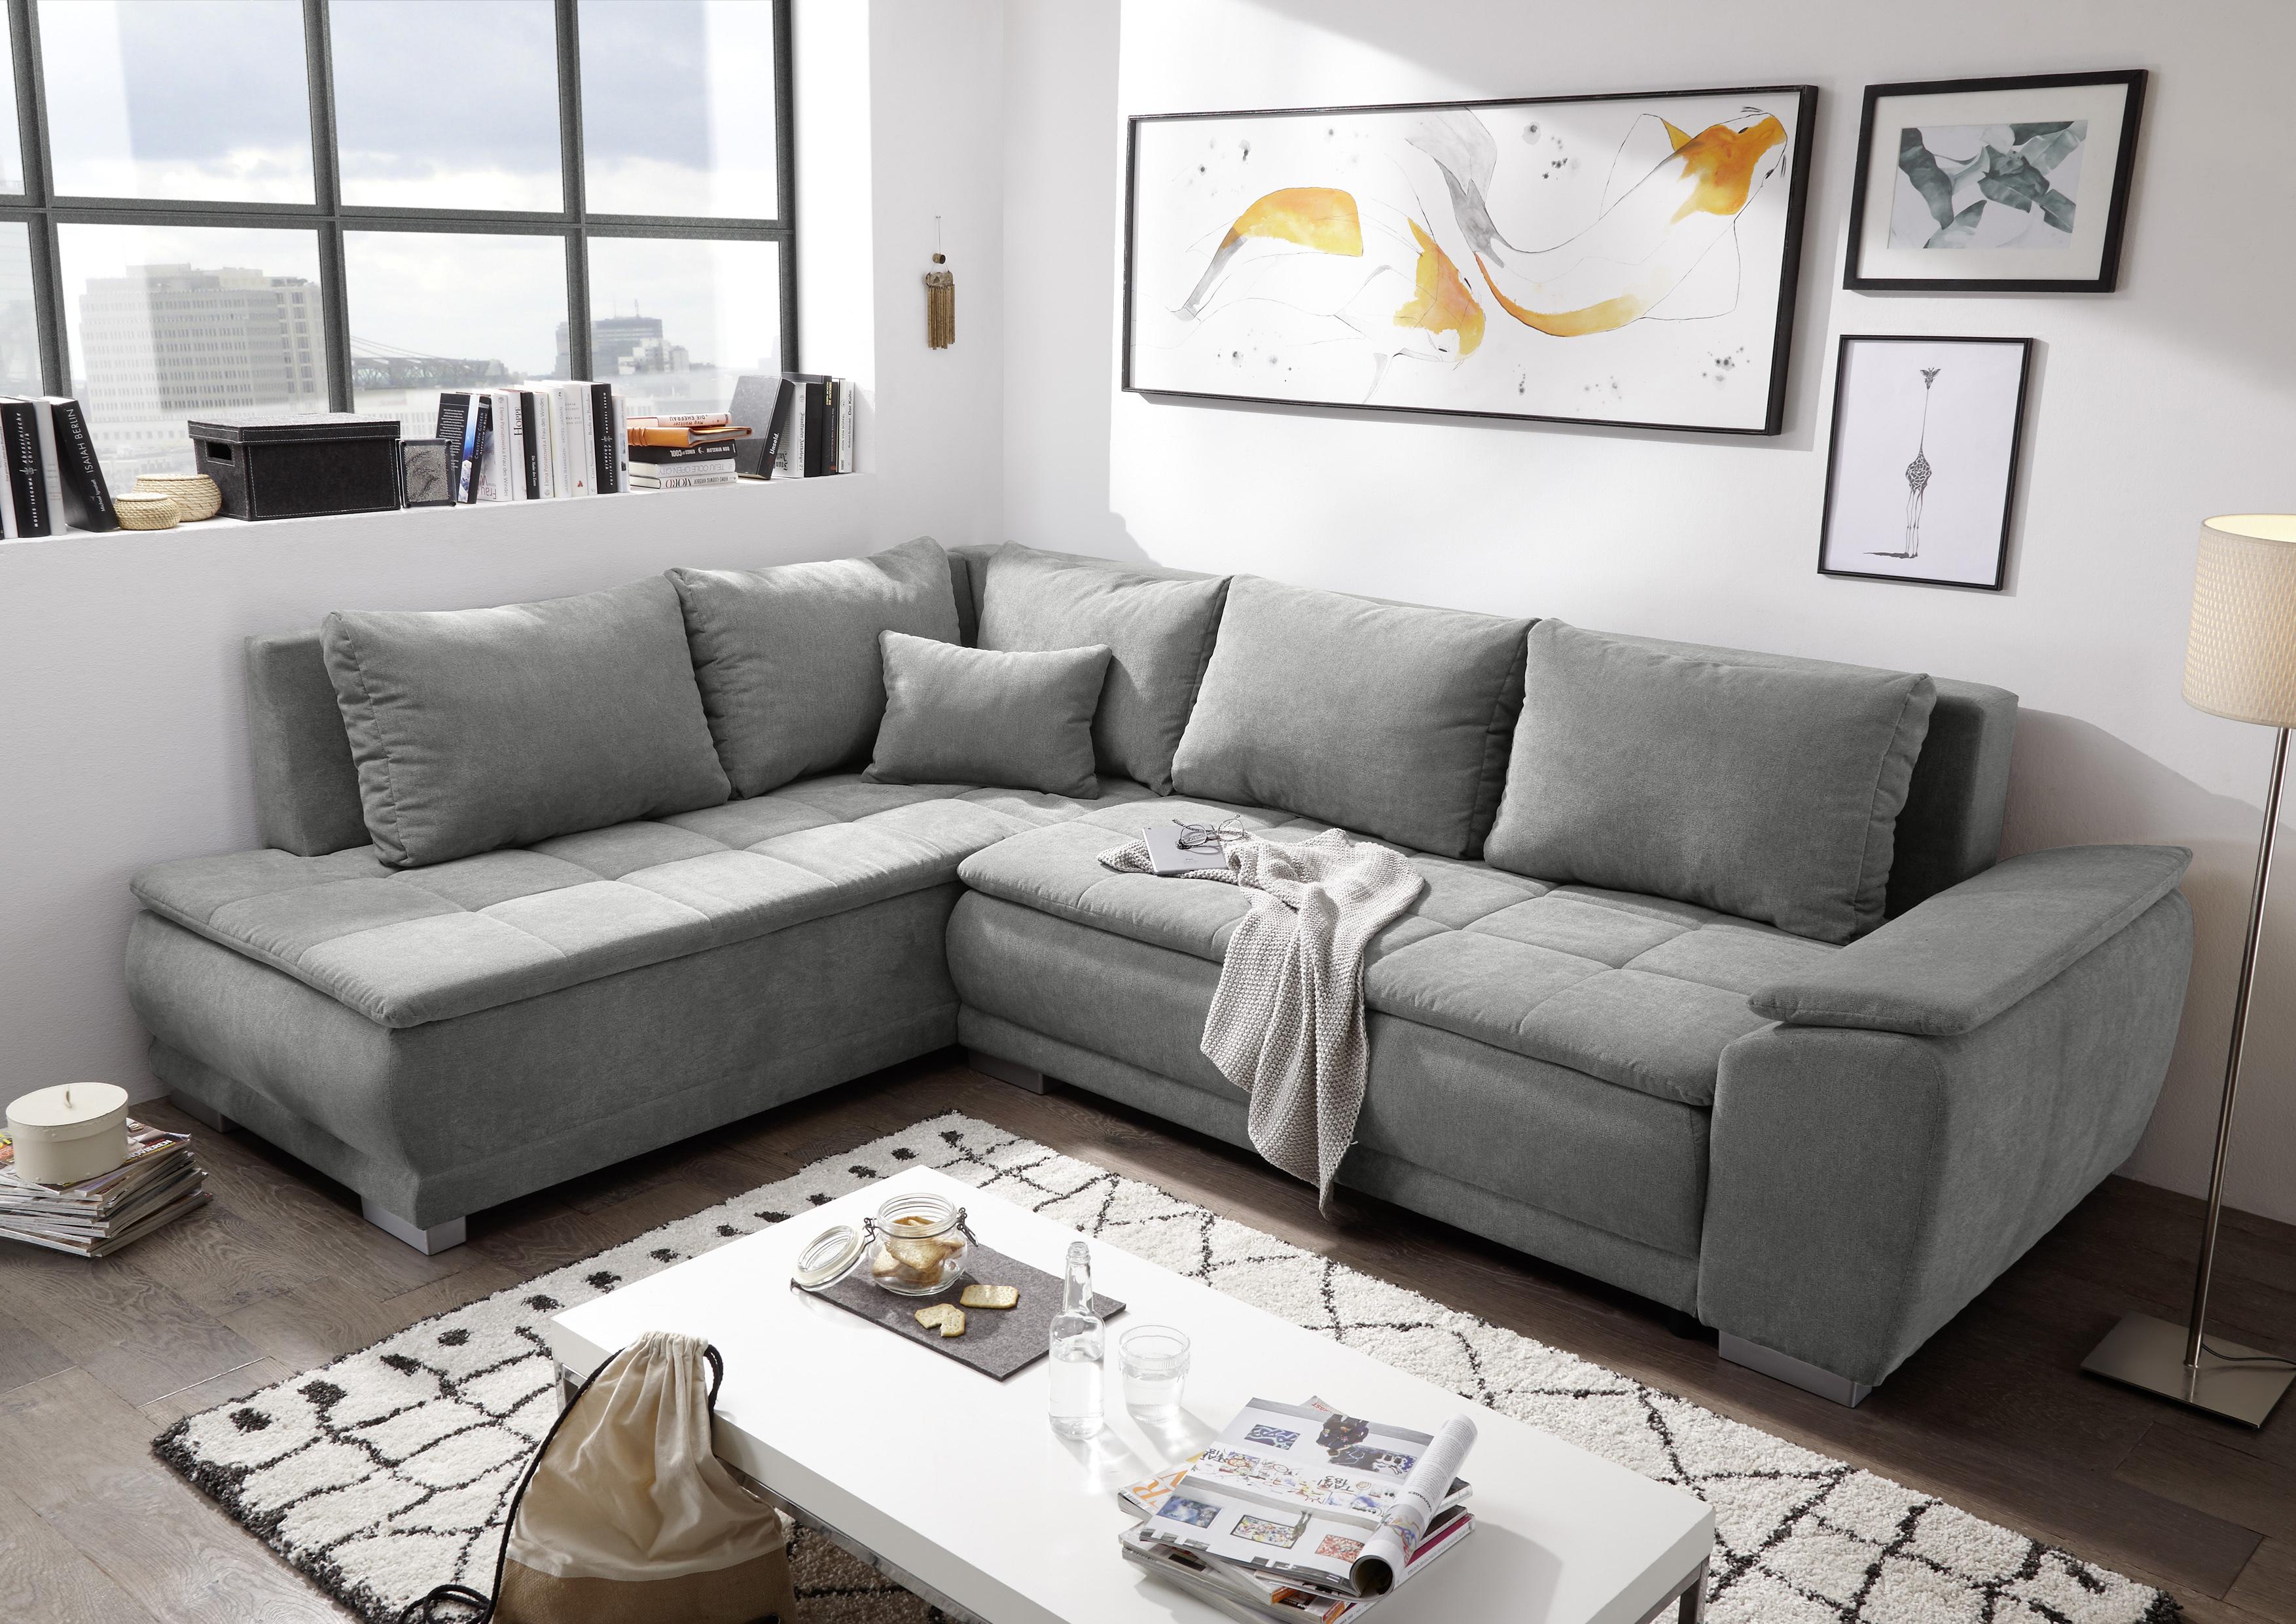 ecksofa couch malia sofa schlafcouch bettsofa schlamm grau. Black Bedroom Furniture Sets. Home Design Ideas